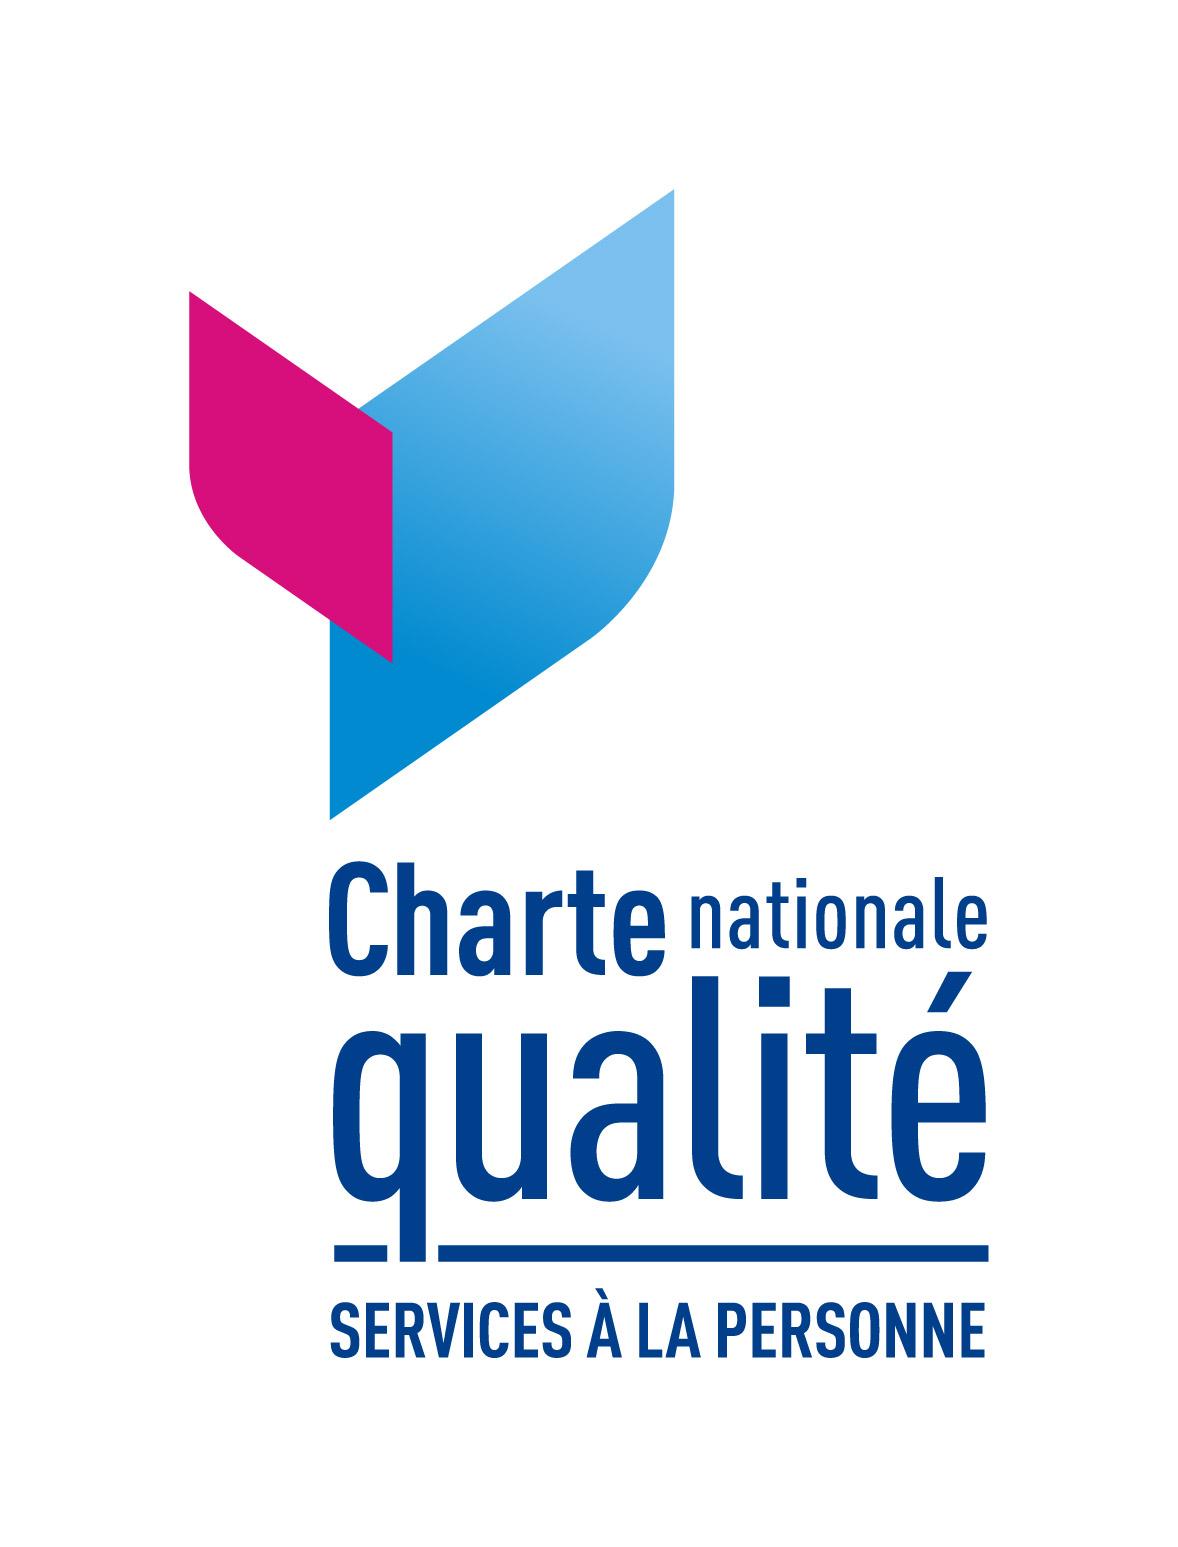 Adherez Ou Renouvelez Votre Adhesion A La Charte Nationale Qualite